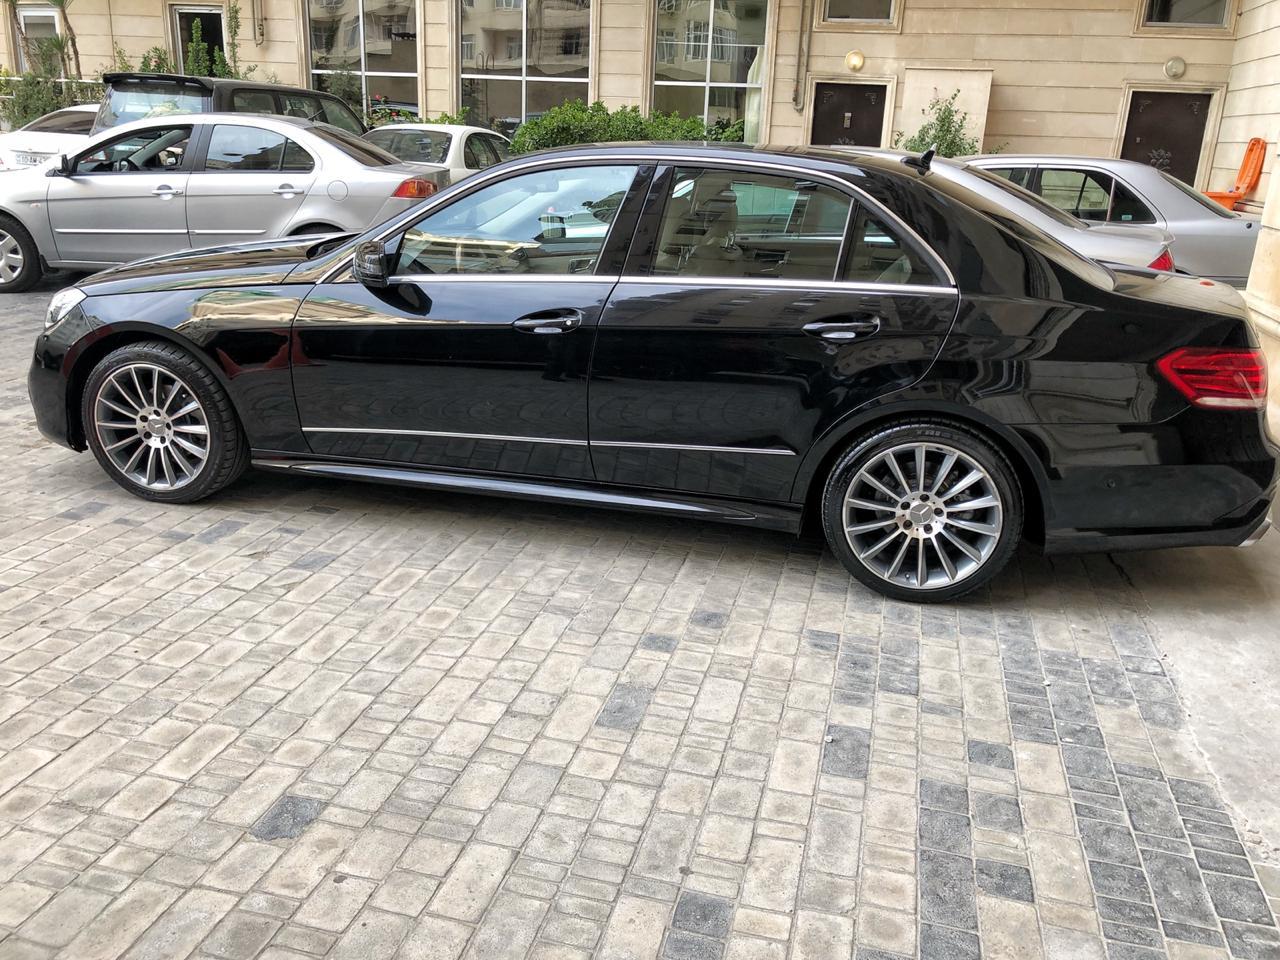 Mercedes-Benz E 220 2.2(lt) 2011 İkinci əl  $22500